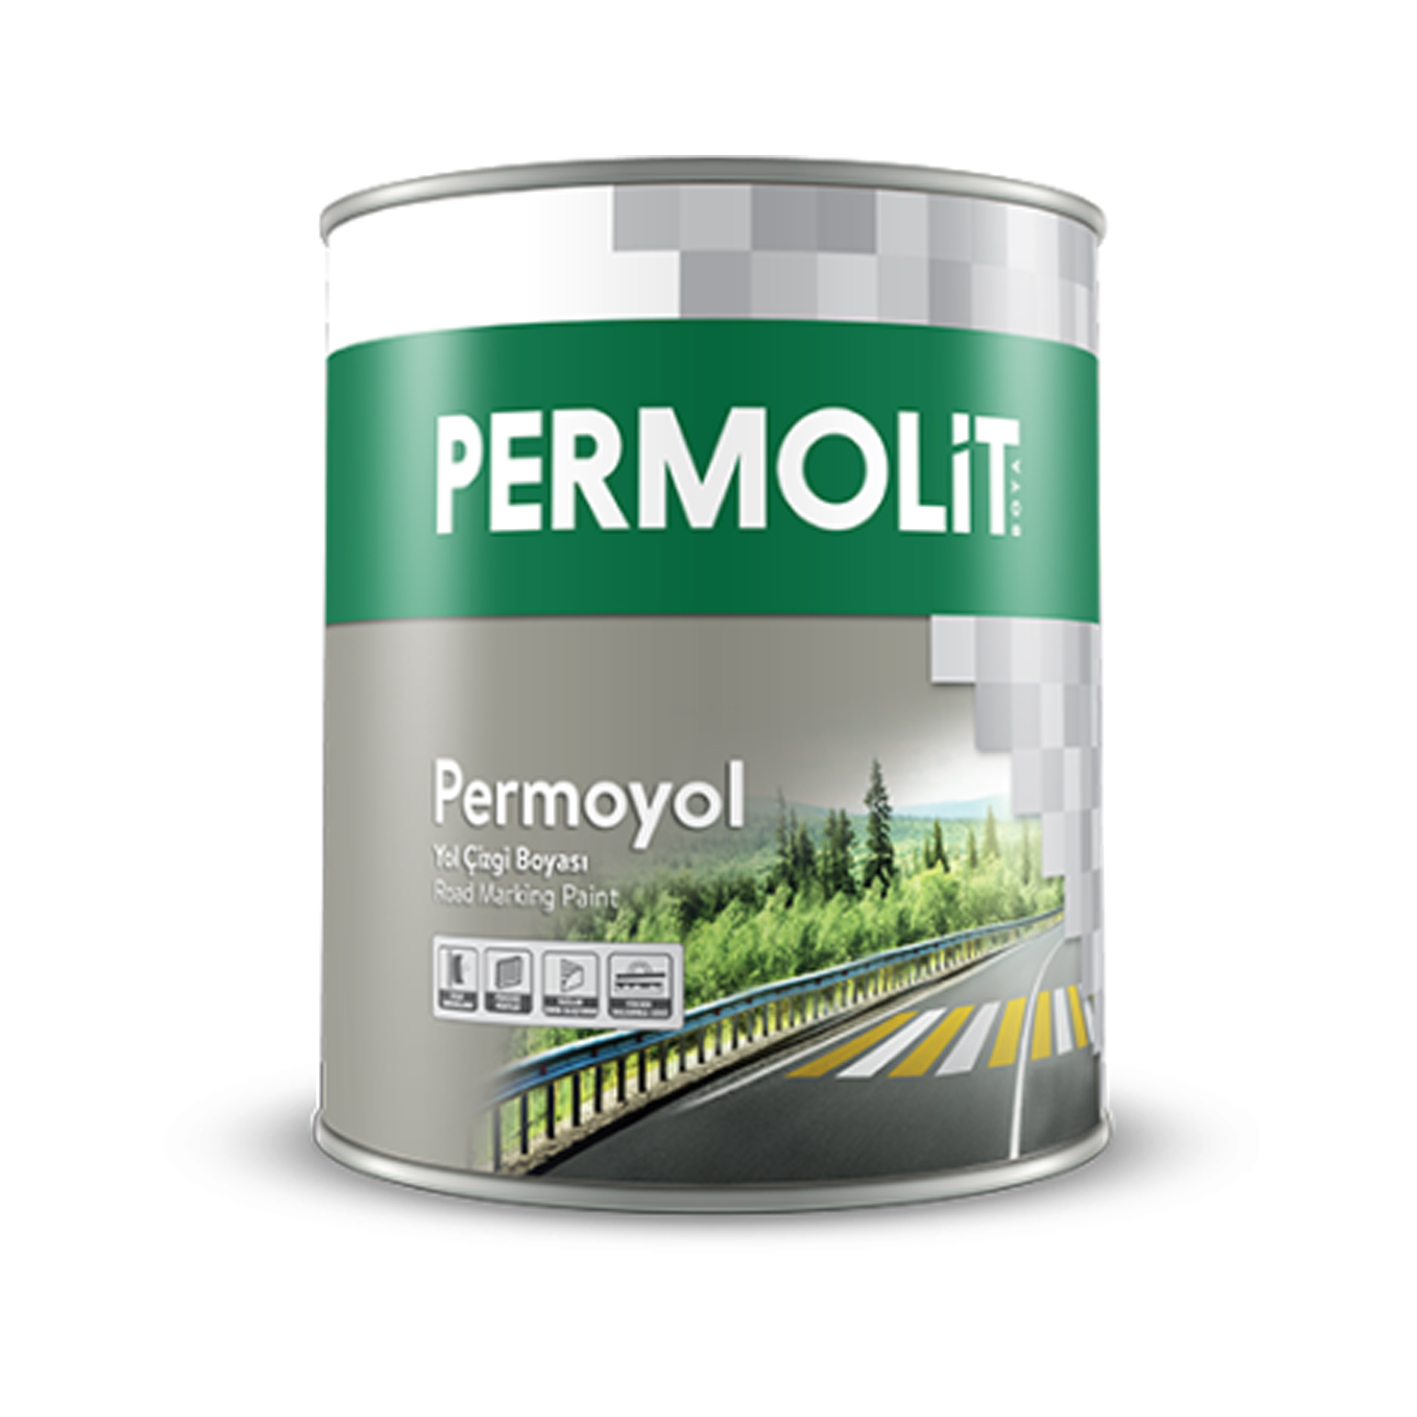 Permolit Permoyol Yol Çizgi Boyası Beyaz 20Kg